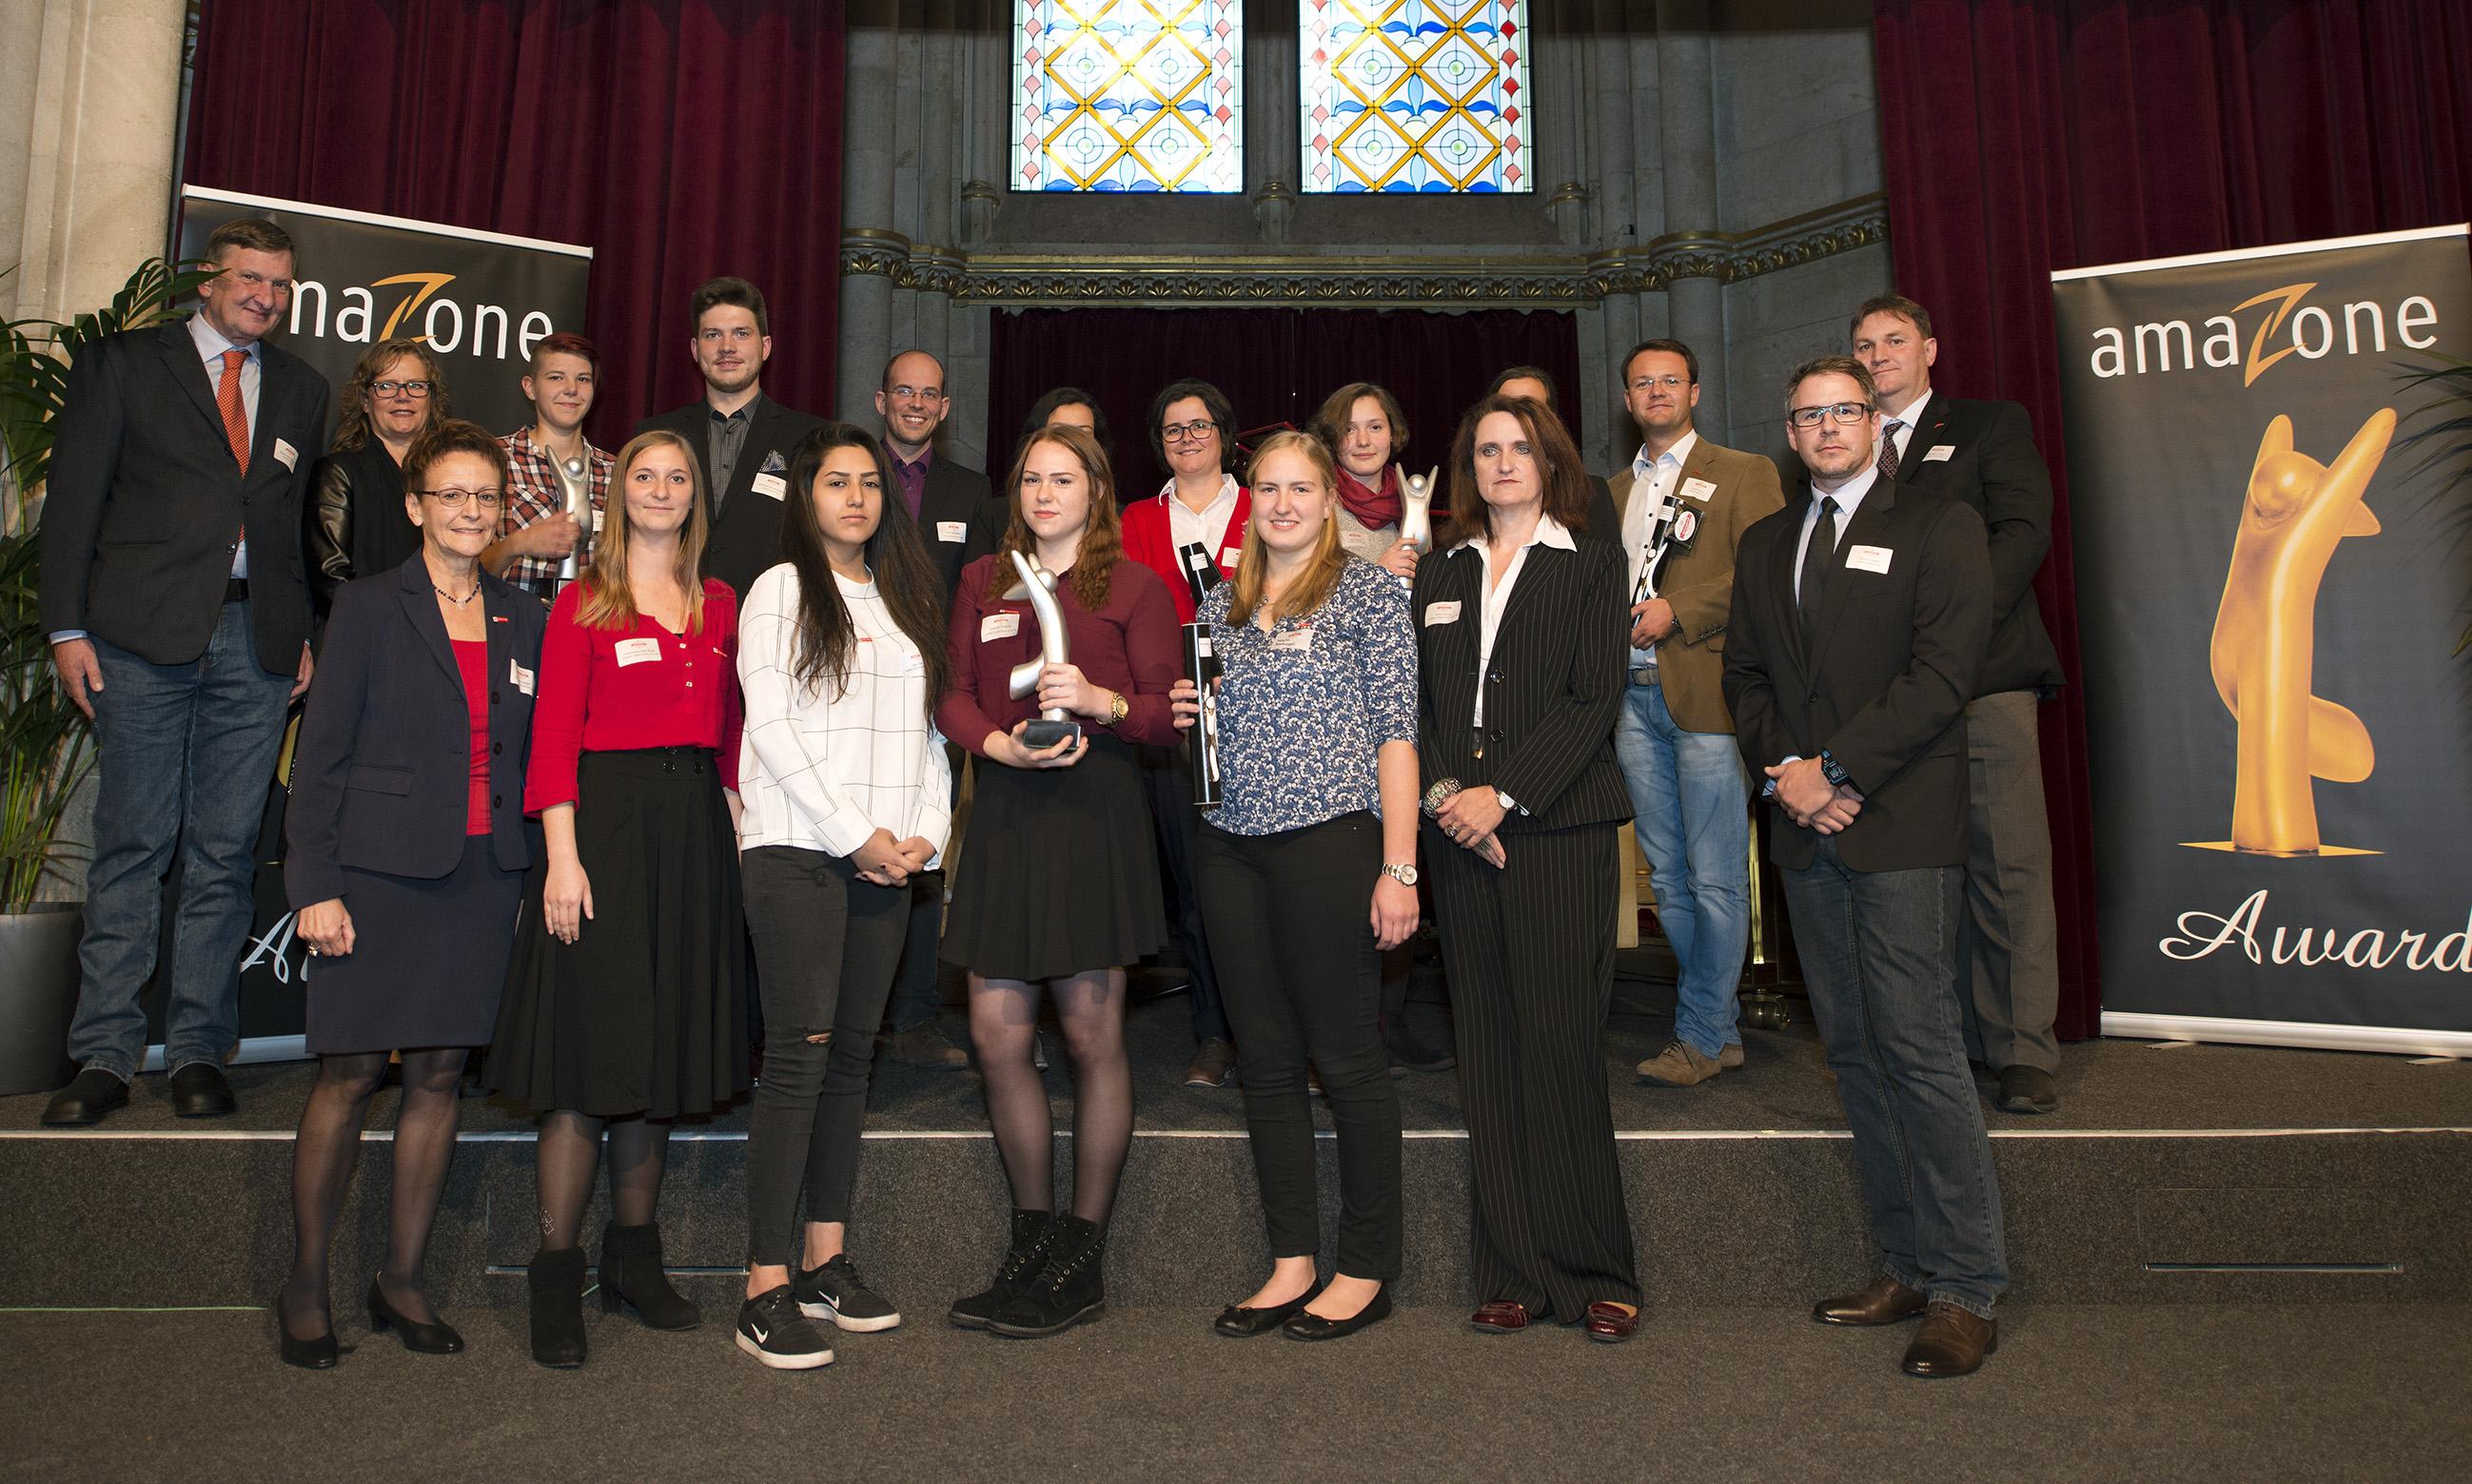 amaZone-Award Gewinner 2017